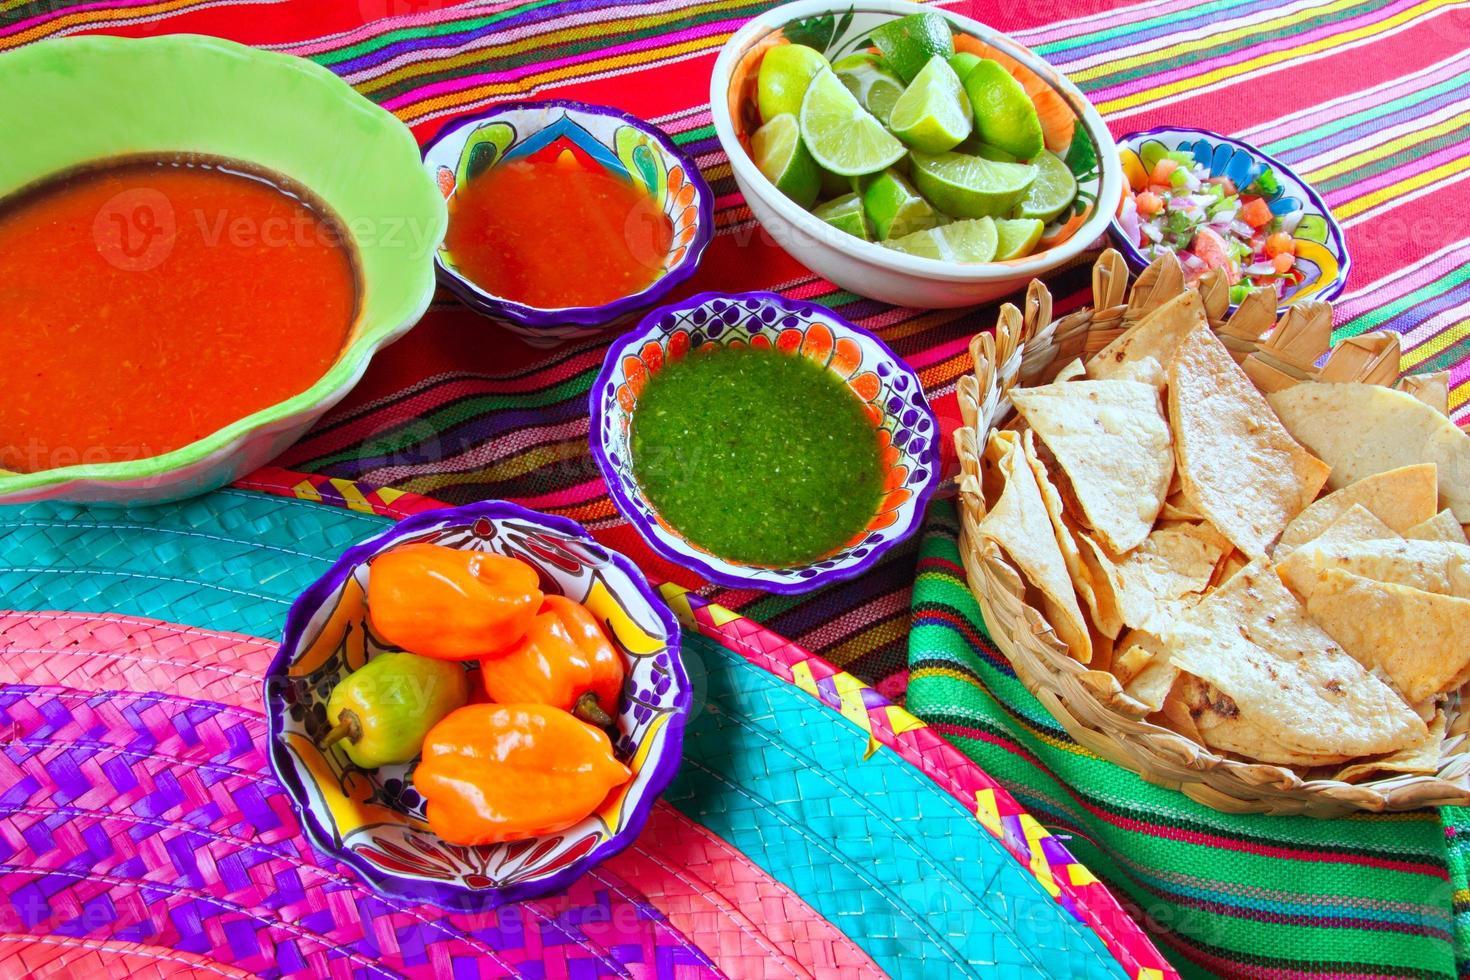 mexikansk mat varierad chili såser nachos citron foto